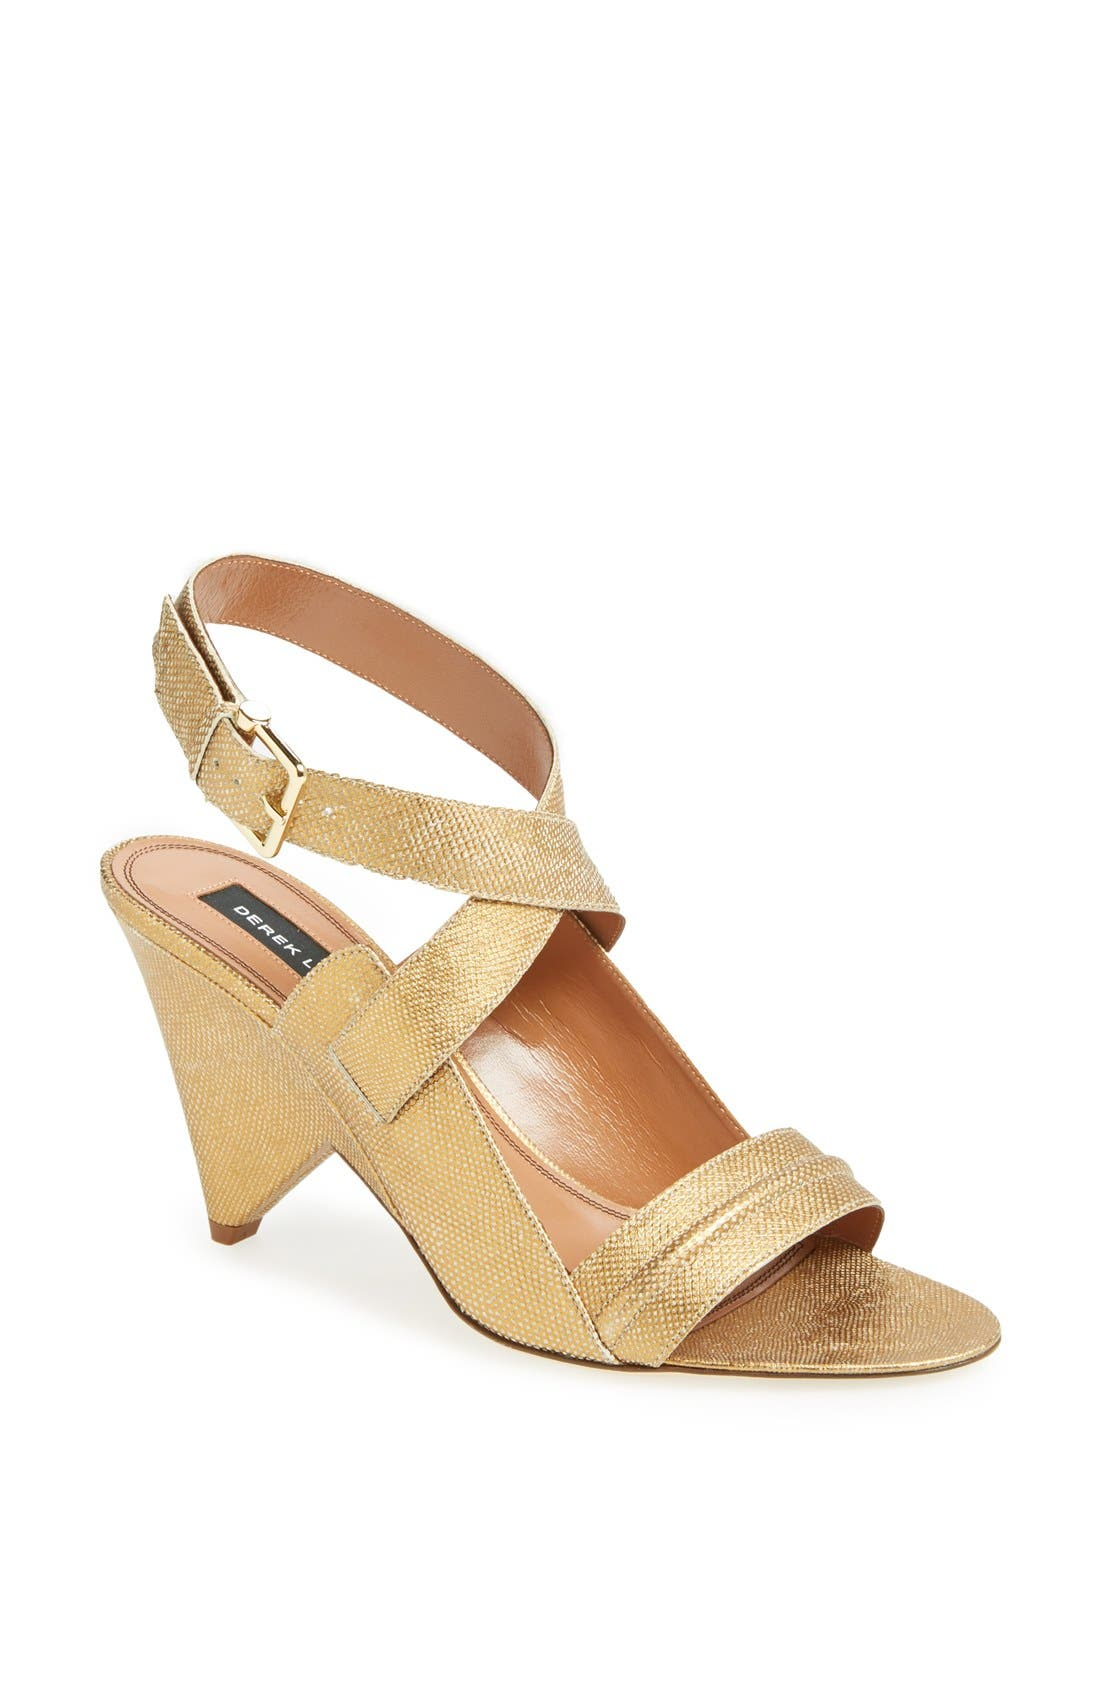 DEREK LAM 'Pace' Sandal, Main, color, 221